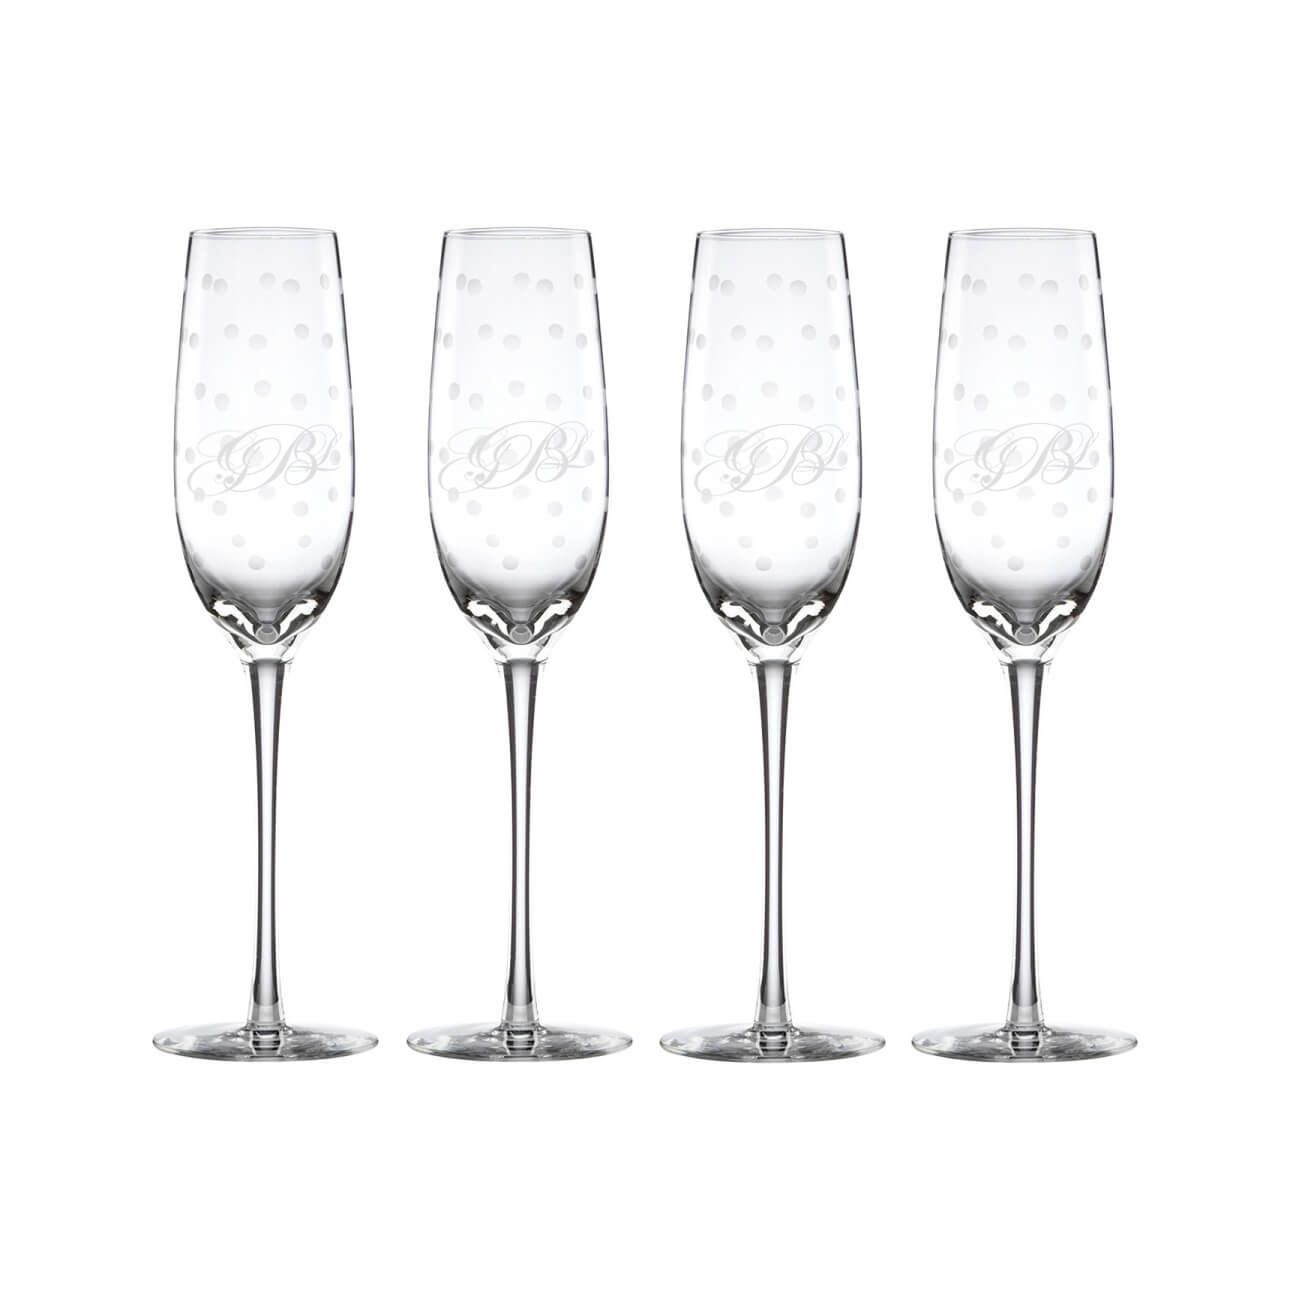 Registration of wedding glasses 97